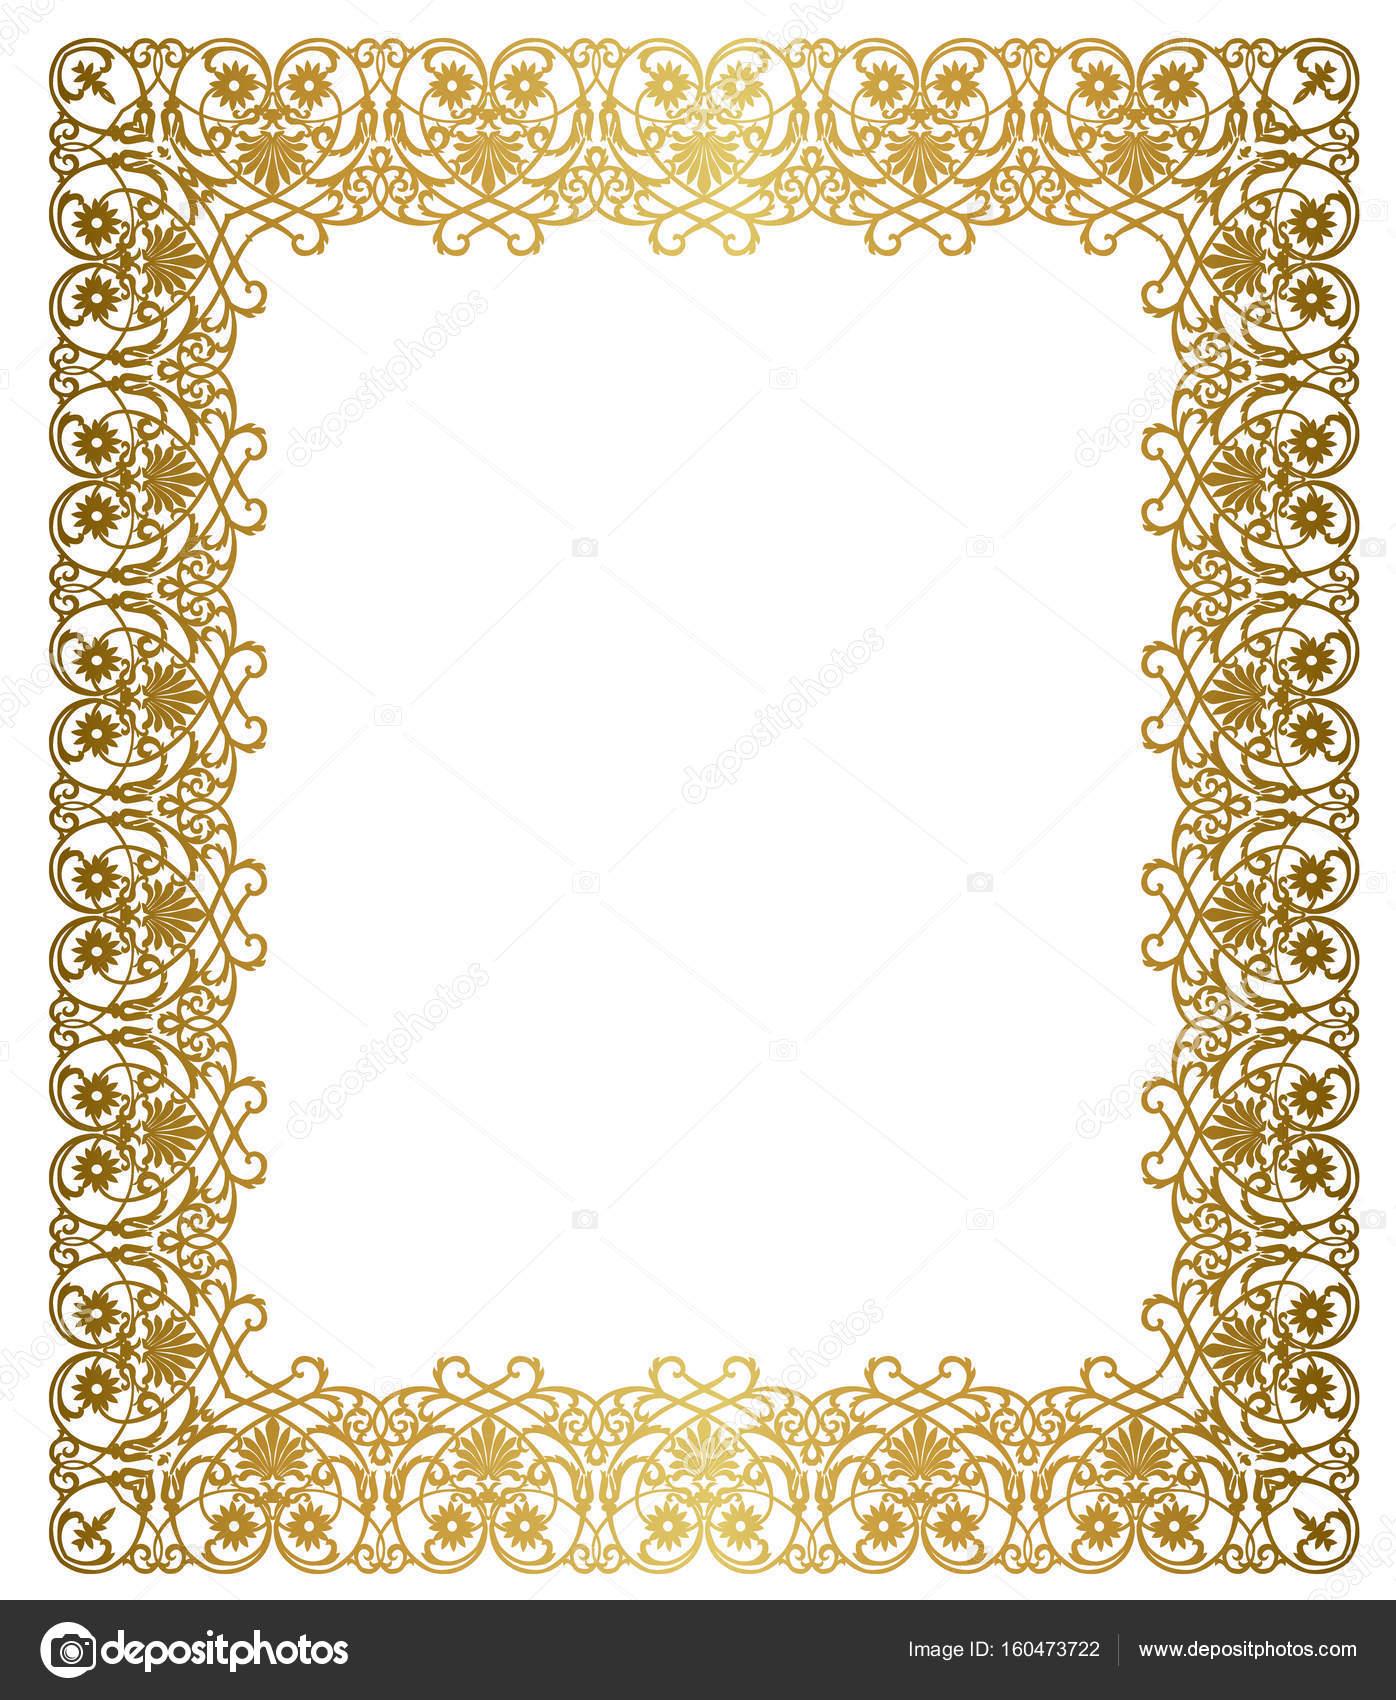 dcd0c7abc09 Elegant gold frame — Stock Vector © tatiana54  160473722